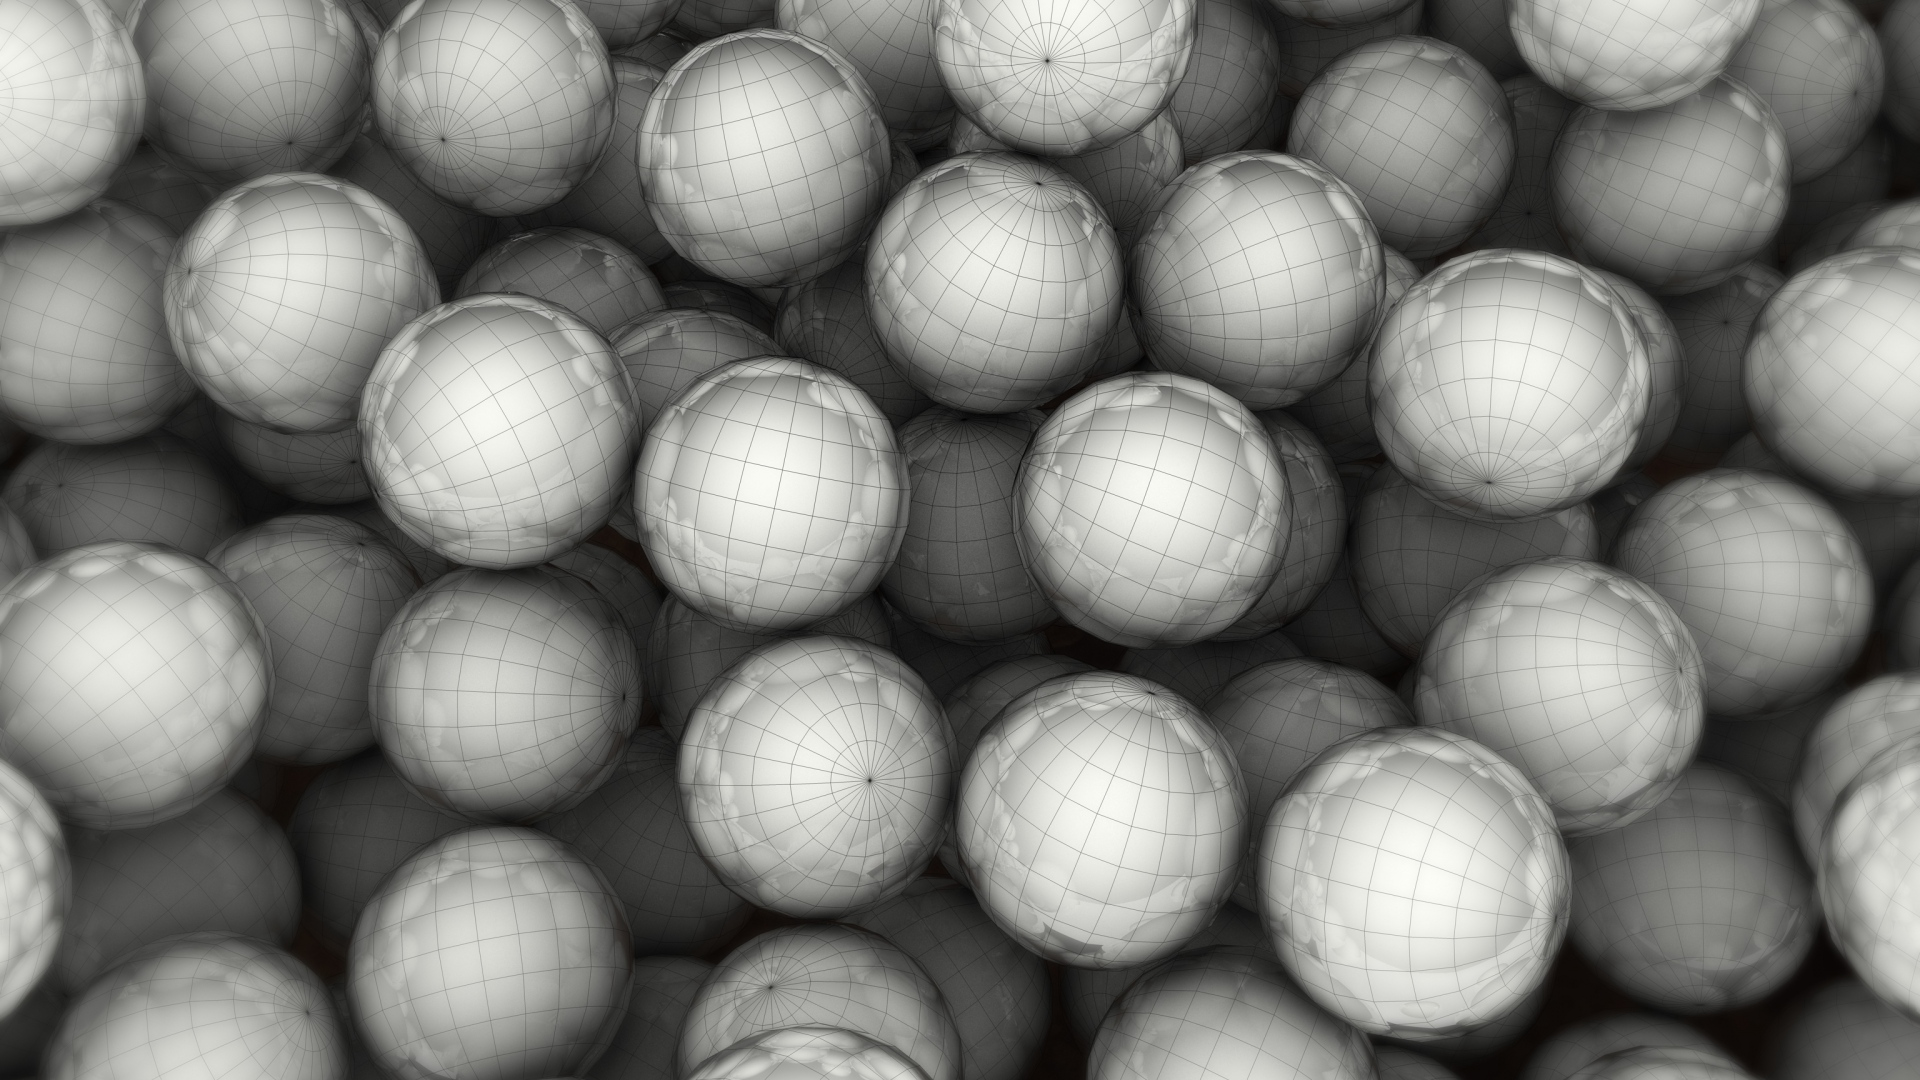 hd hintergrundbilder bälle netze globen grau 1920x1080